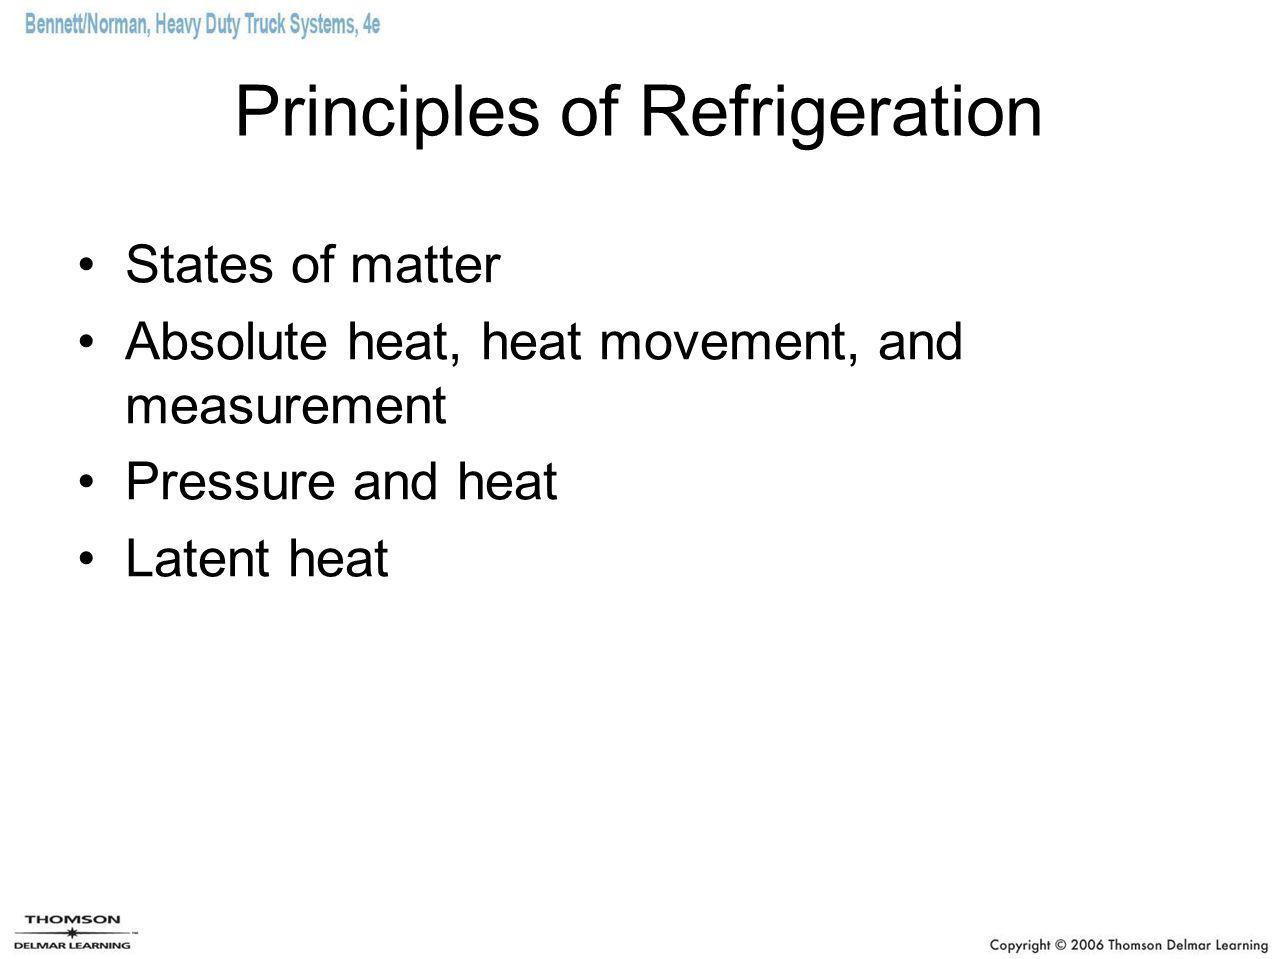 Principles of Refrigeration